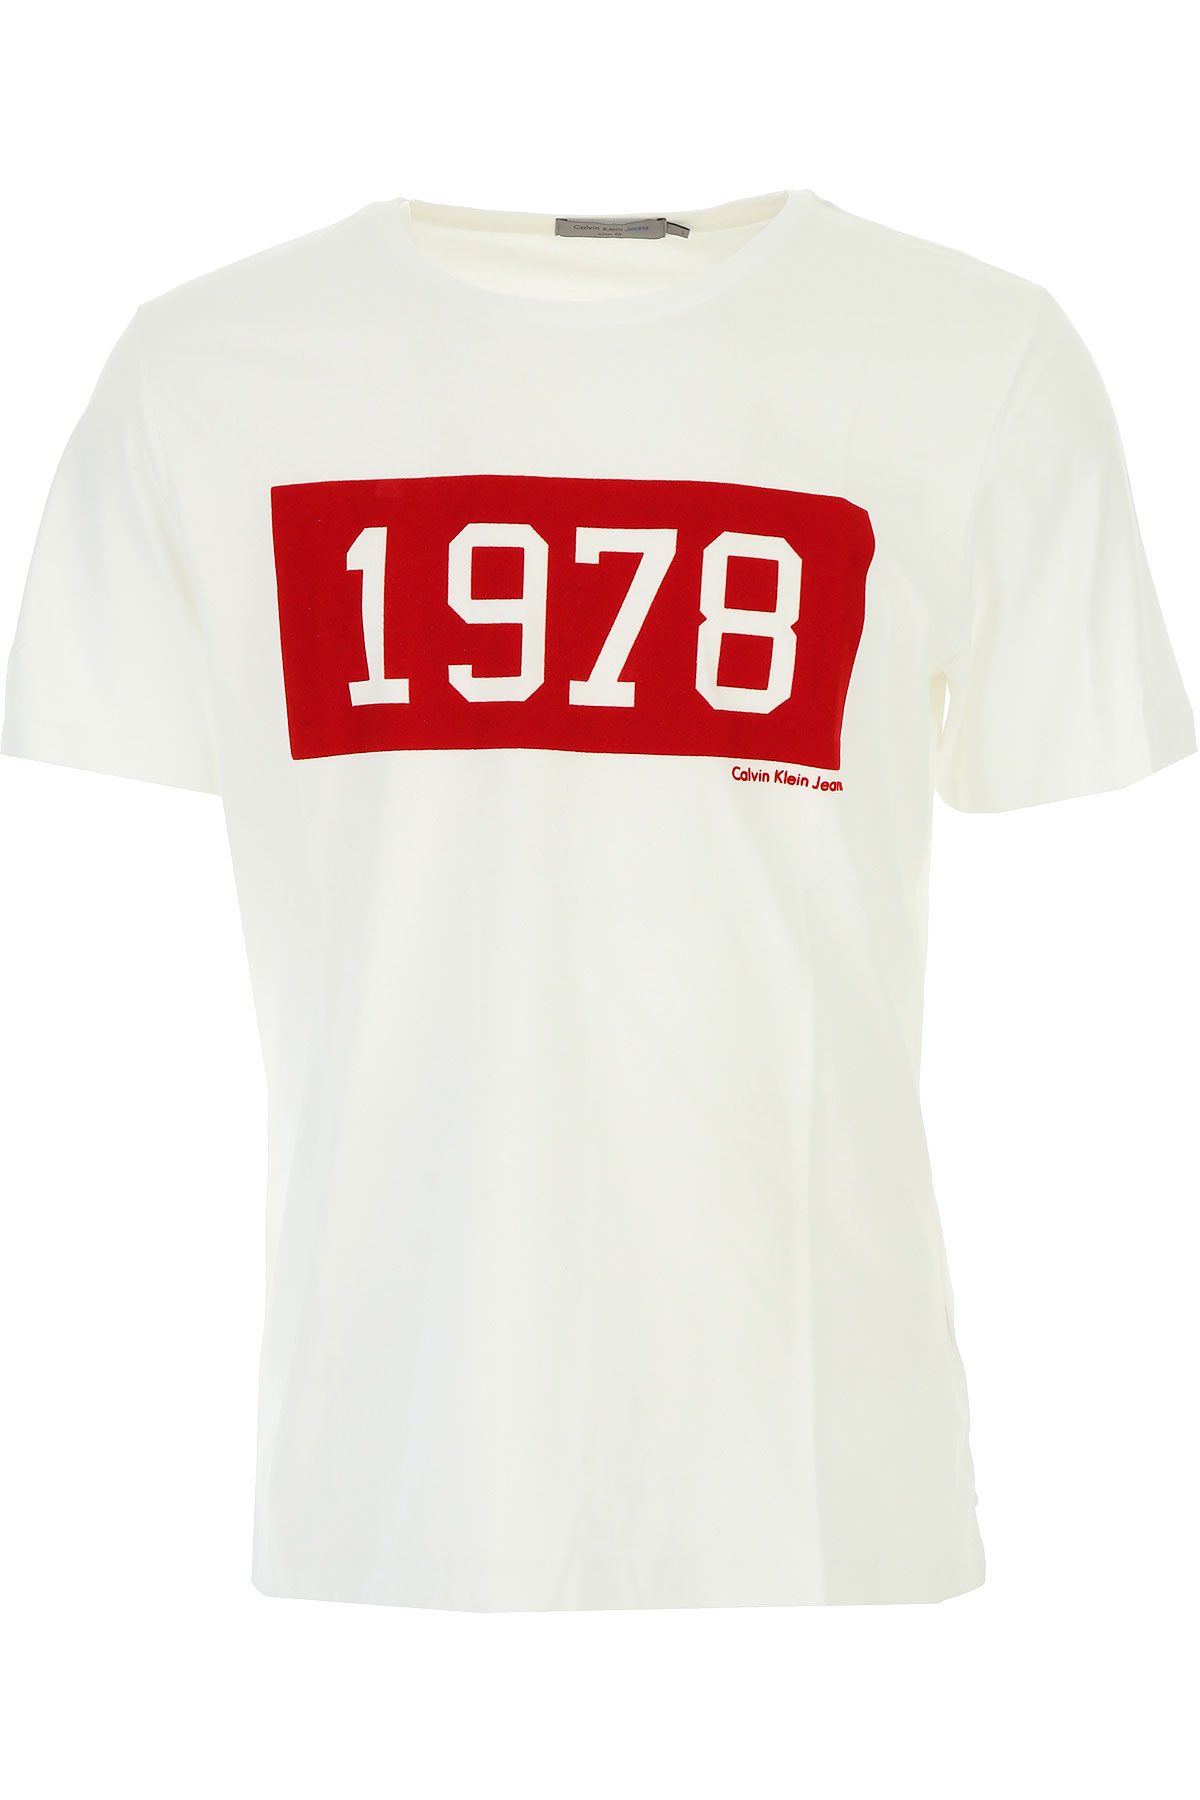 Calvin Klein T-Shirt for Men, White, Cotton, 2017, L M USA-449709